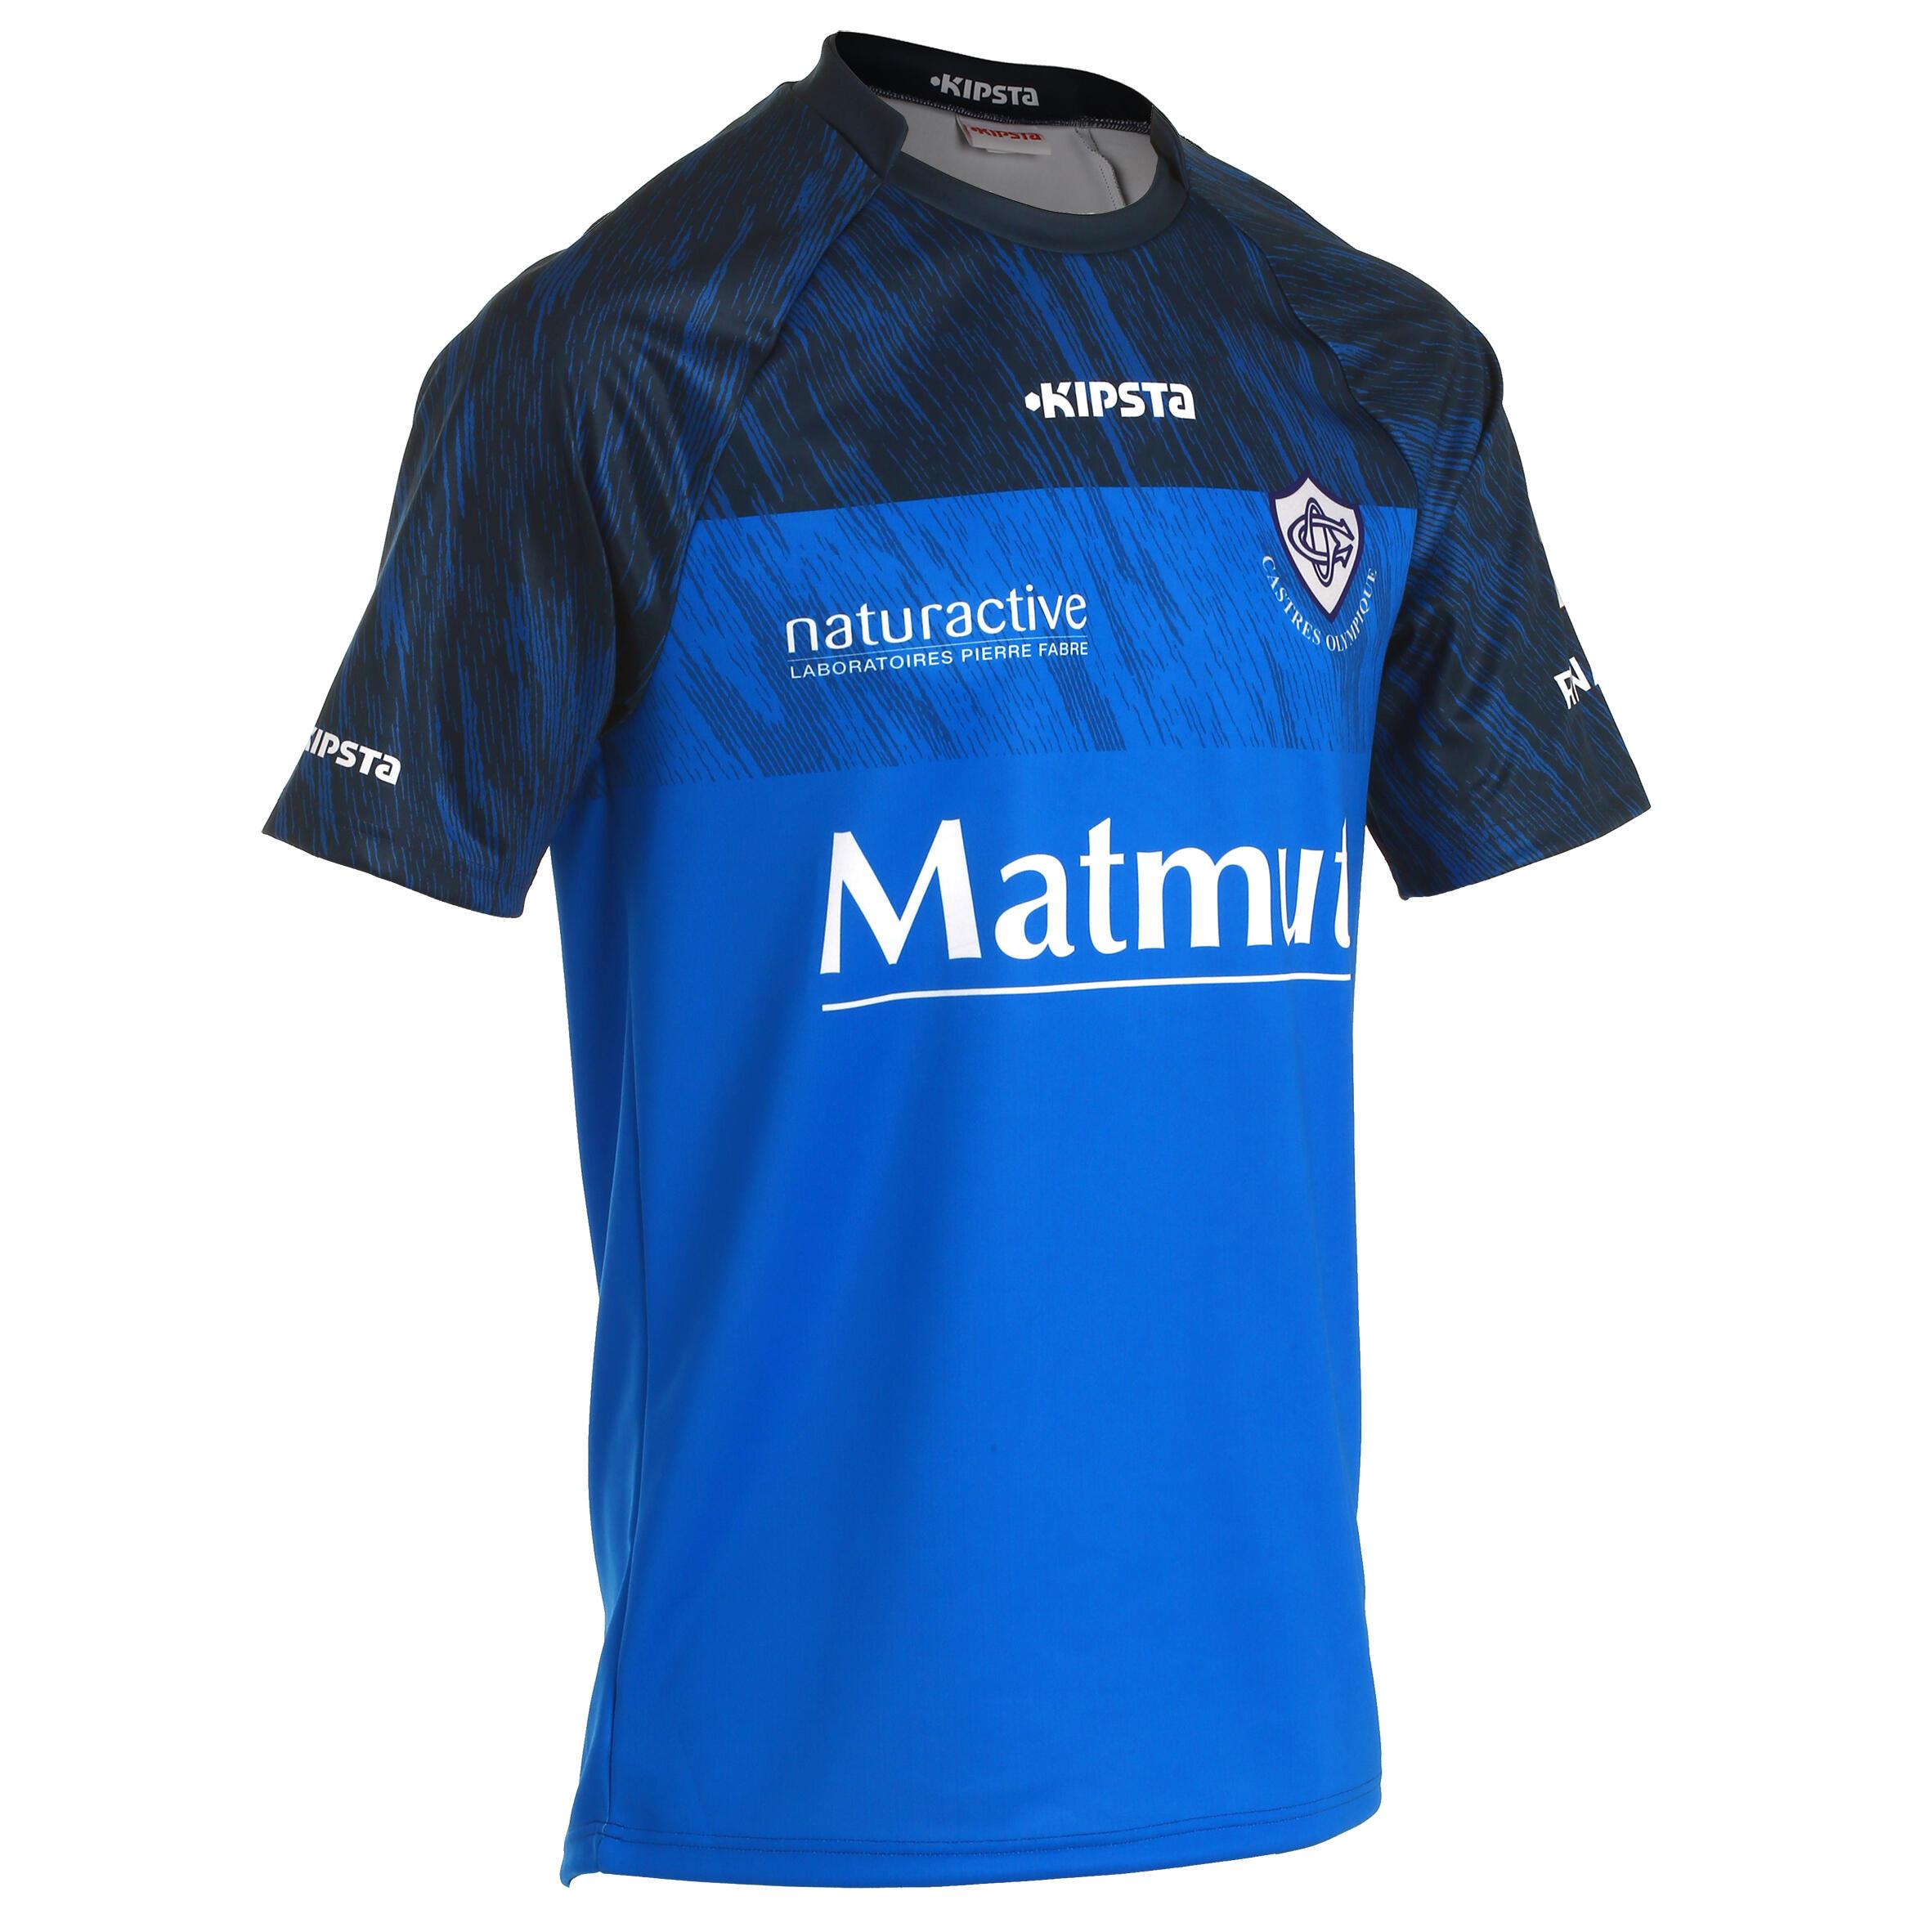 Rugby Heimtrikot 2016-2017 Castres Olympique TOP 14 Replica Erwachsene | Sportbekleidung > Trikots > Sonstige Trikots | Blau | Kipsta